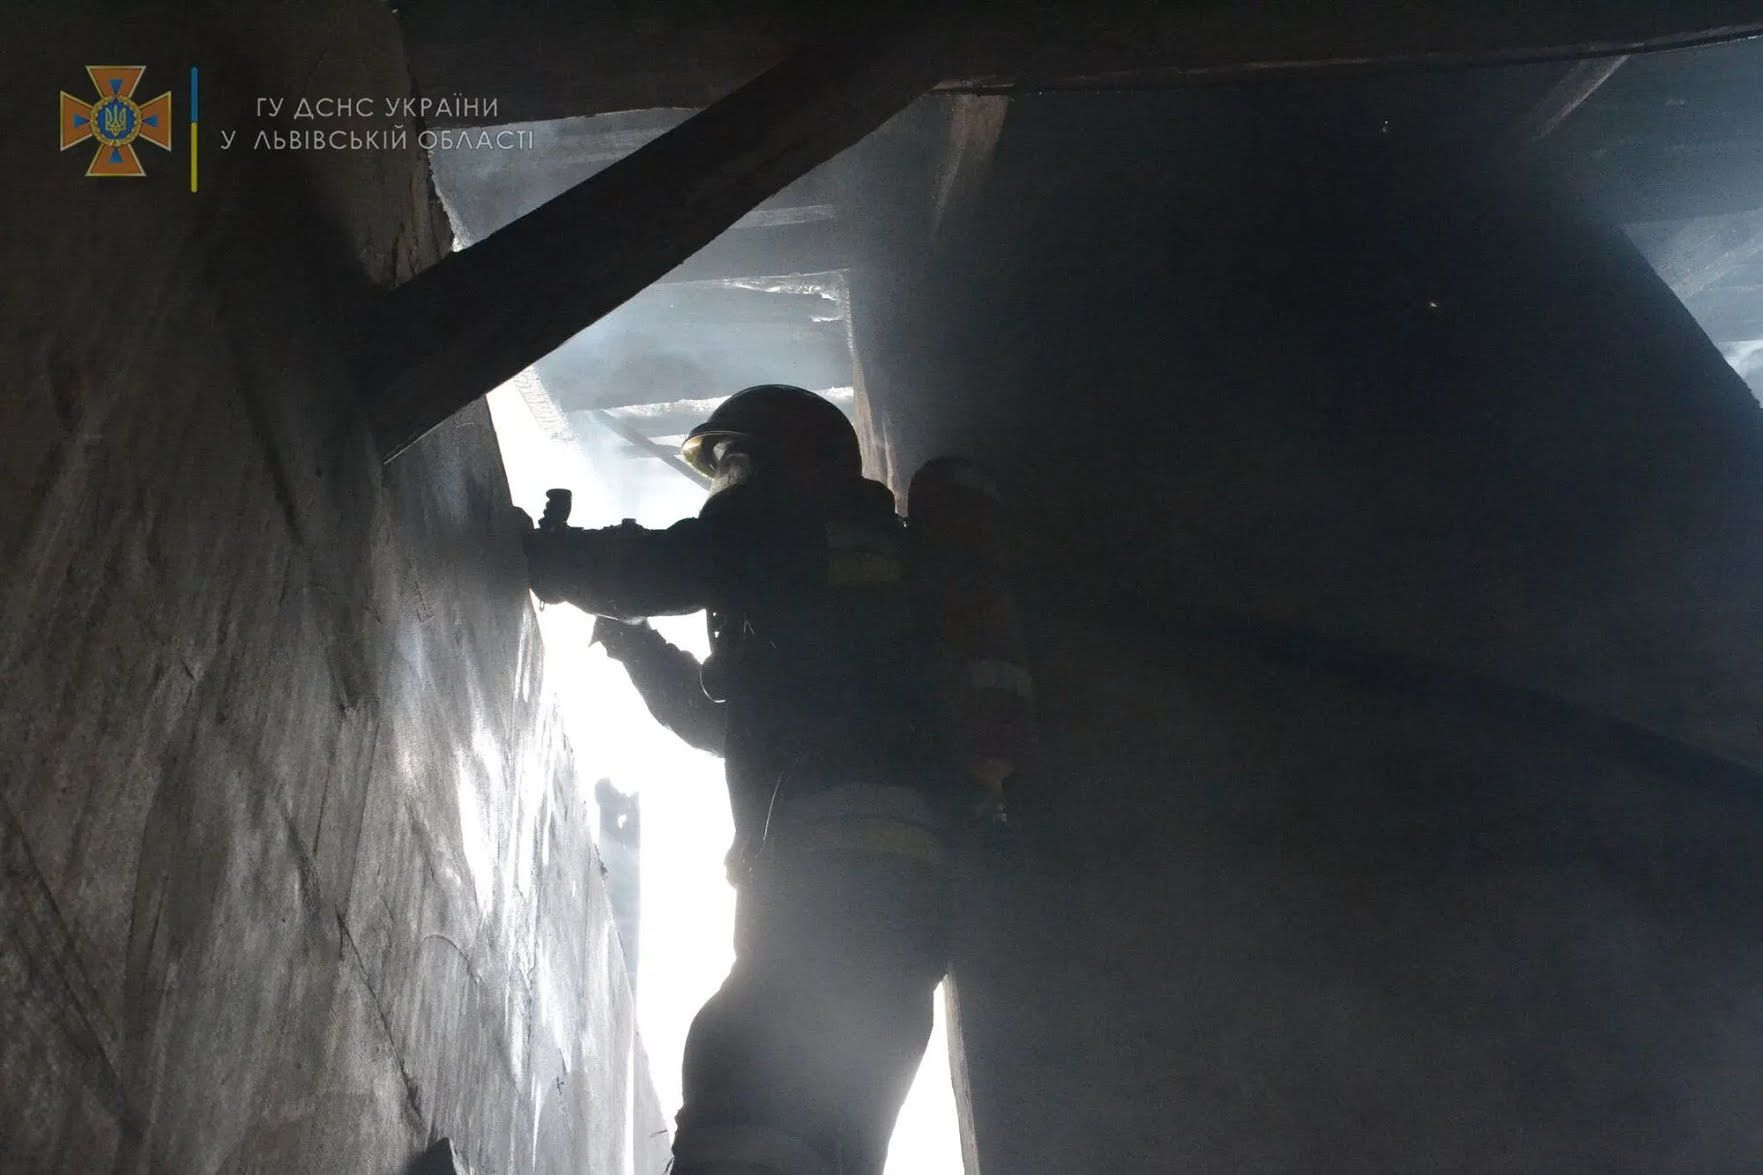 Рятувальники проникли в приміщення, де сталася пожежа